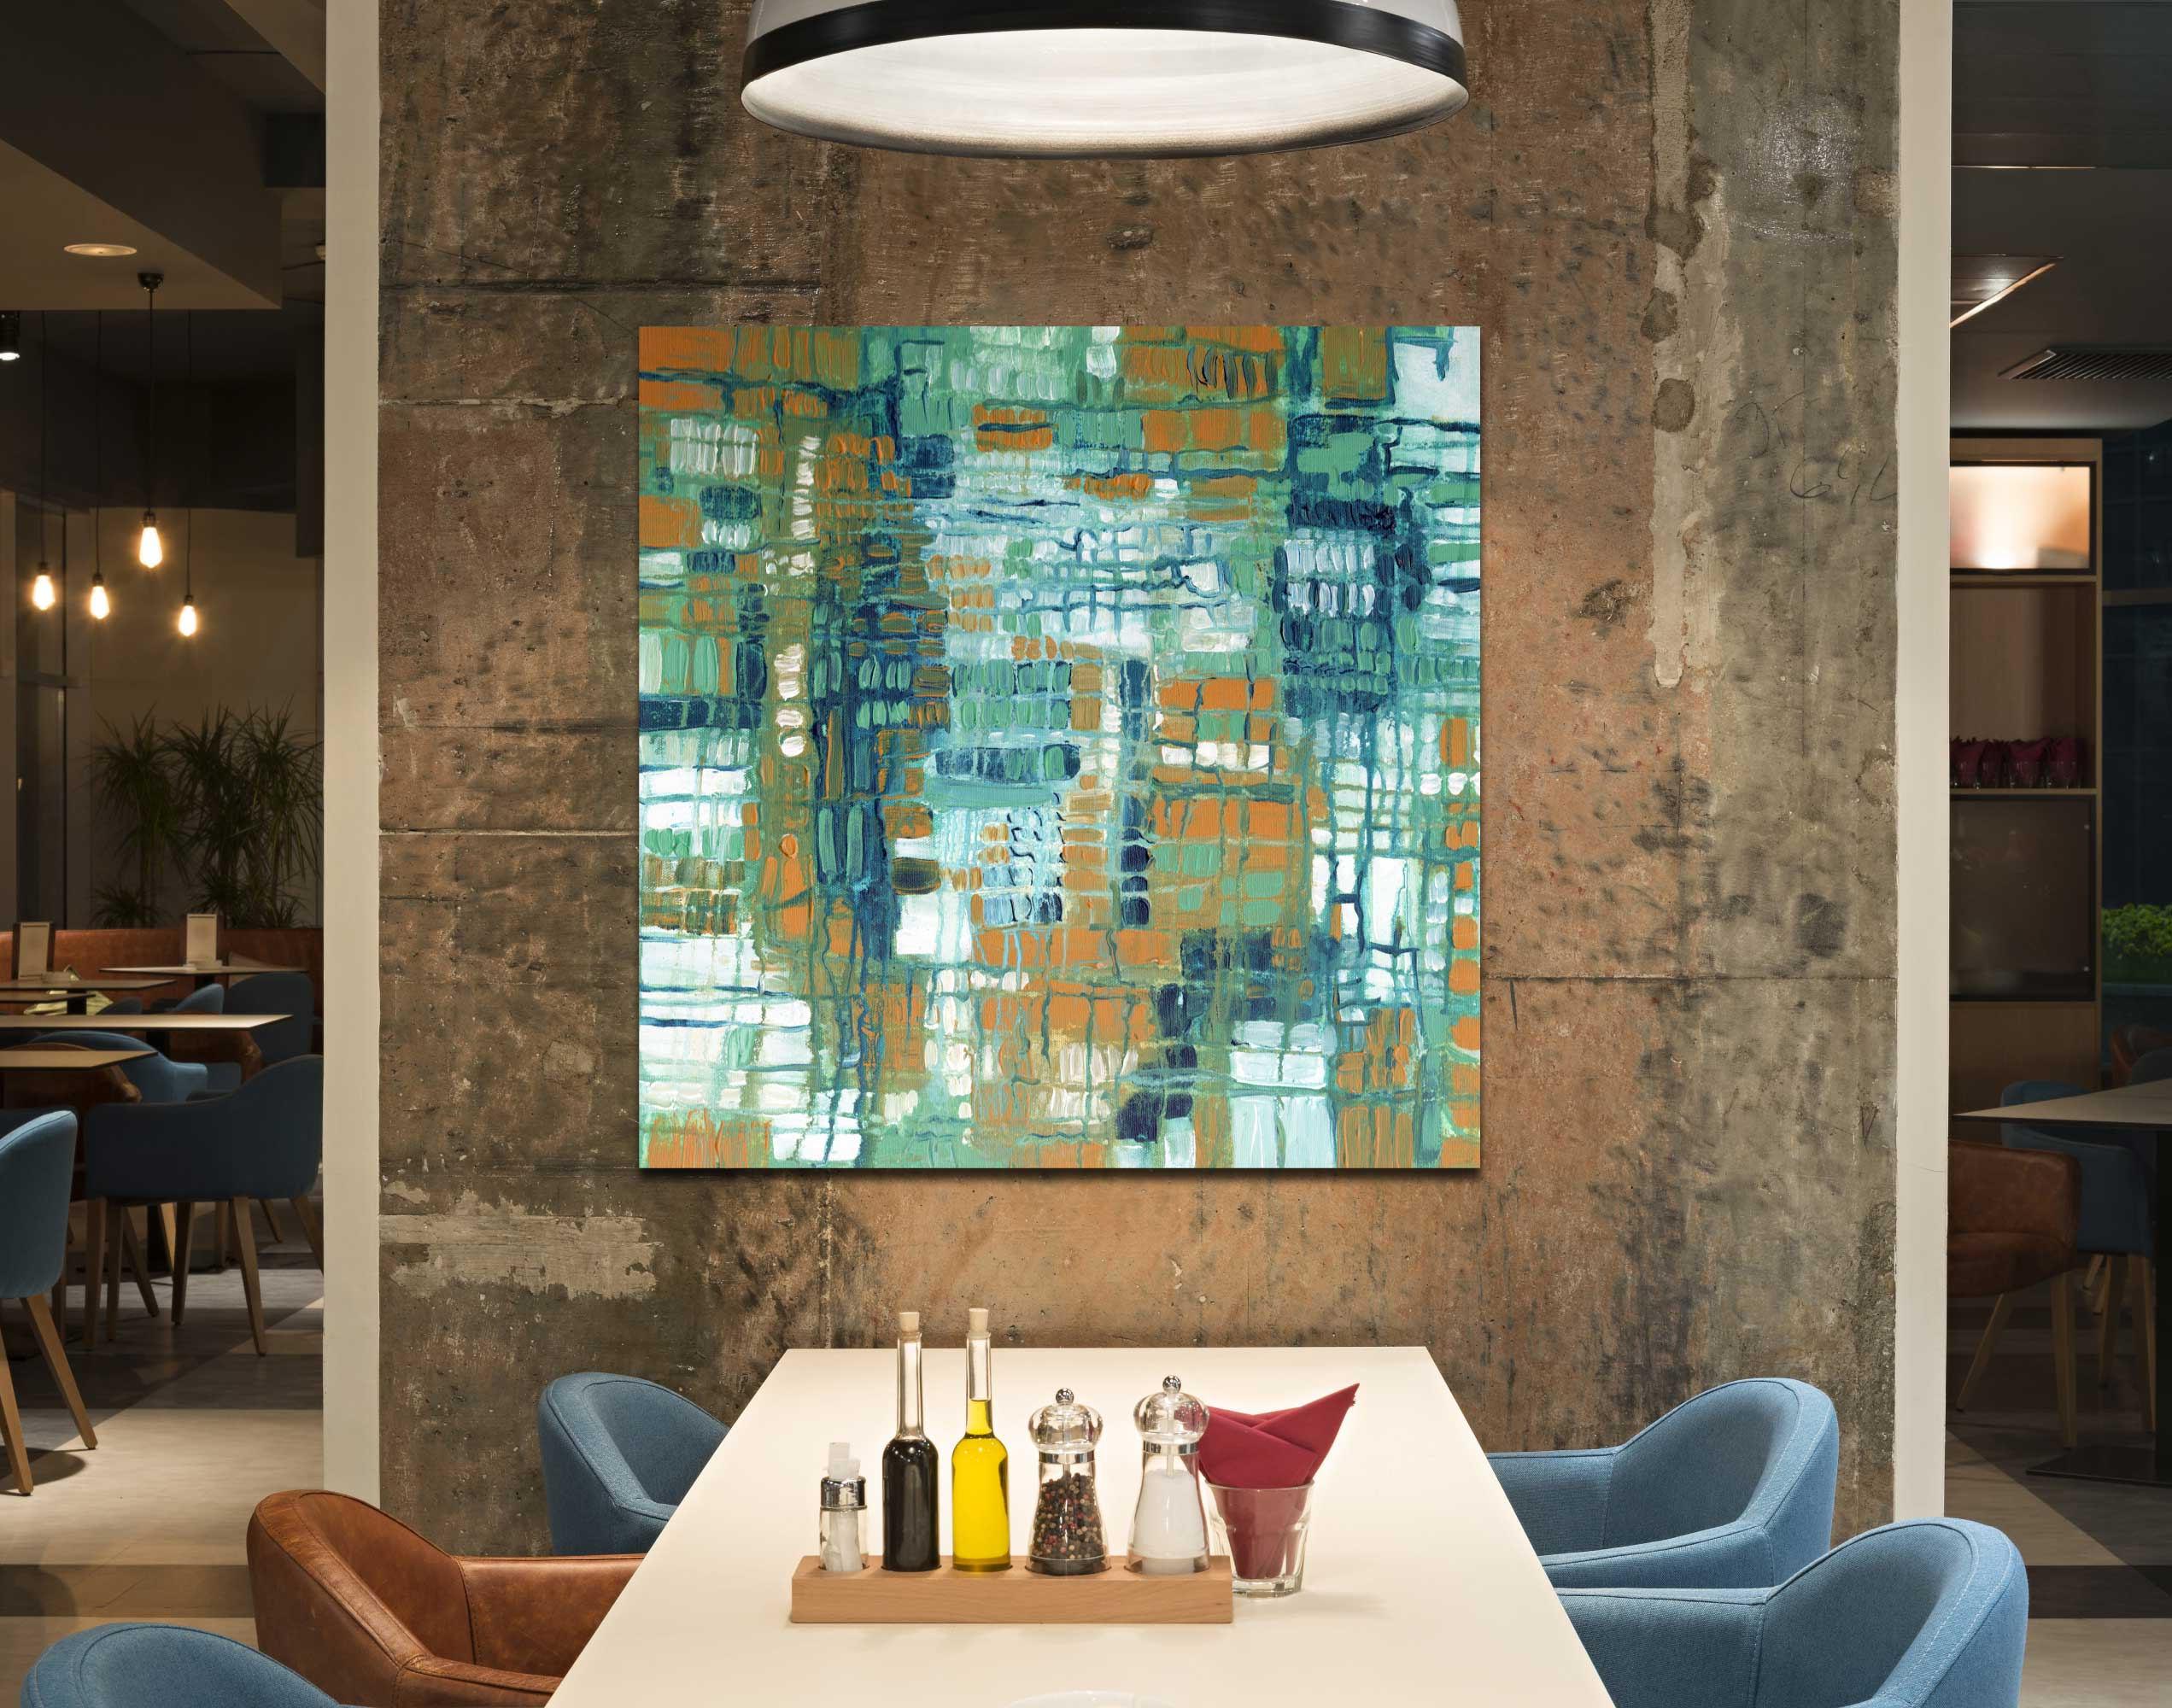 Mid Century Modern Art Modern Art Retro Modern Abstract Painting Restaurant Art Commercial Art Blue Abstract Interior Staging